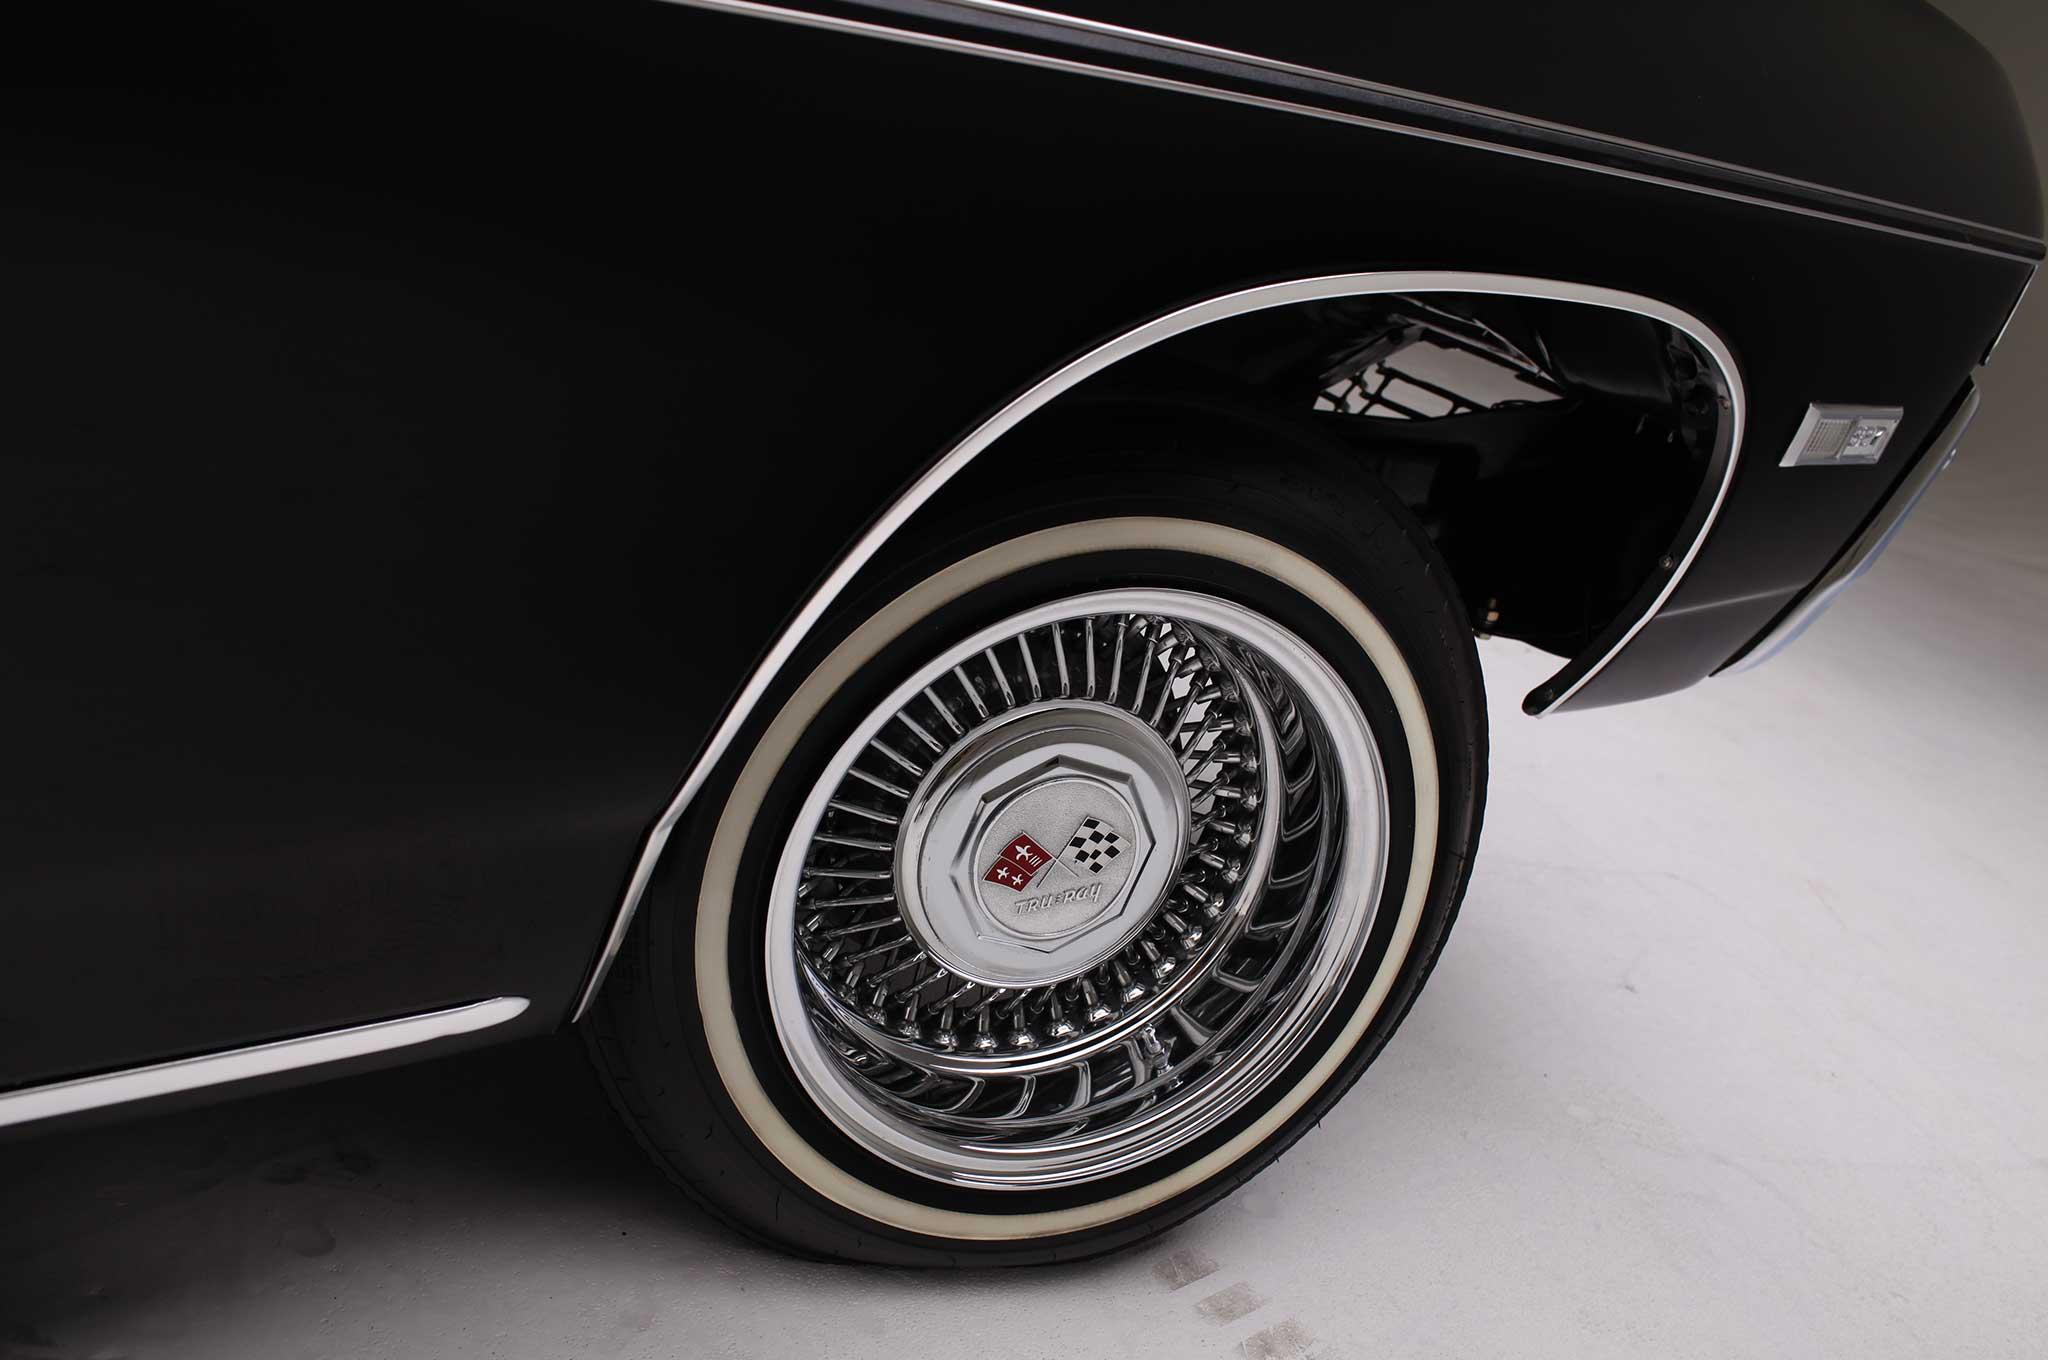 1968-chevrolet-impala-ss-truespoke-wheel